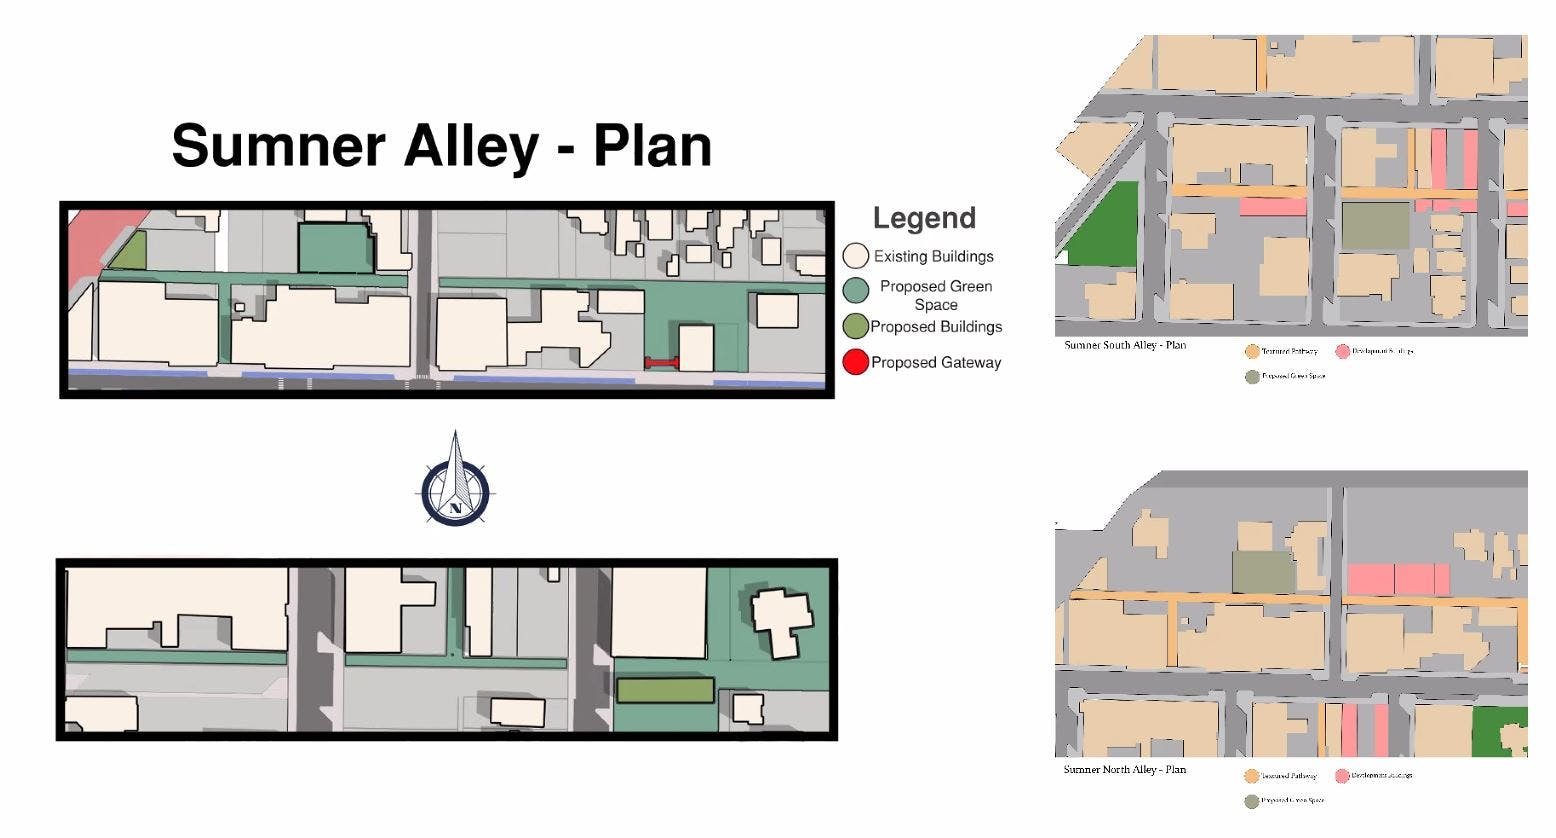 Sumner Alley Plan